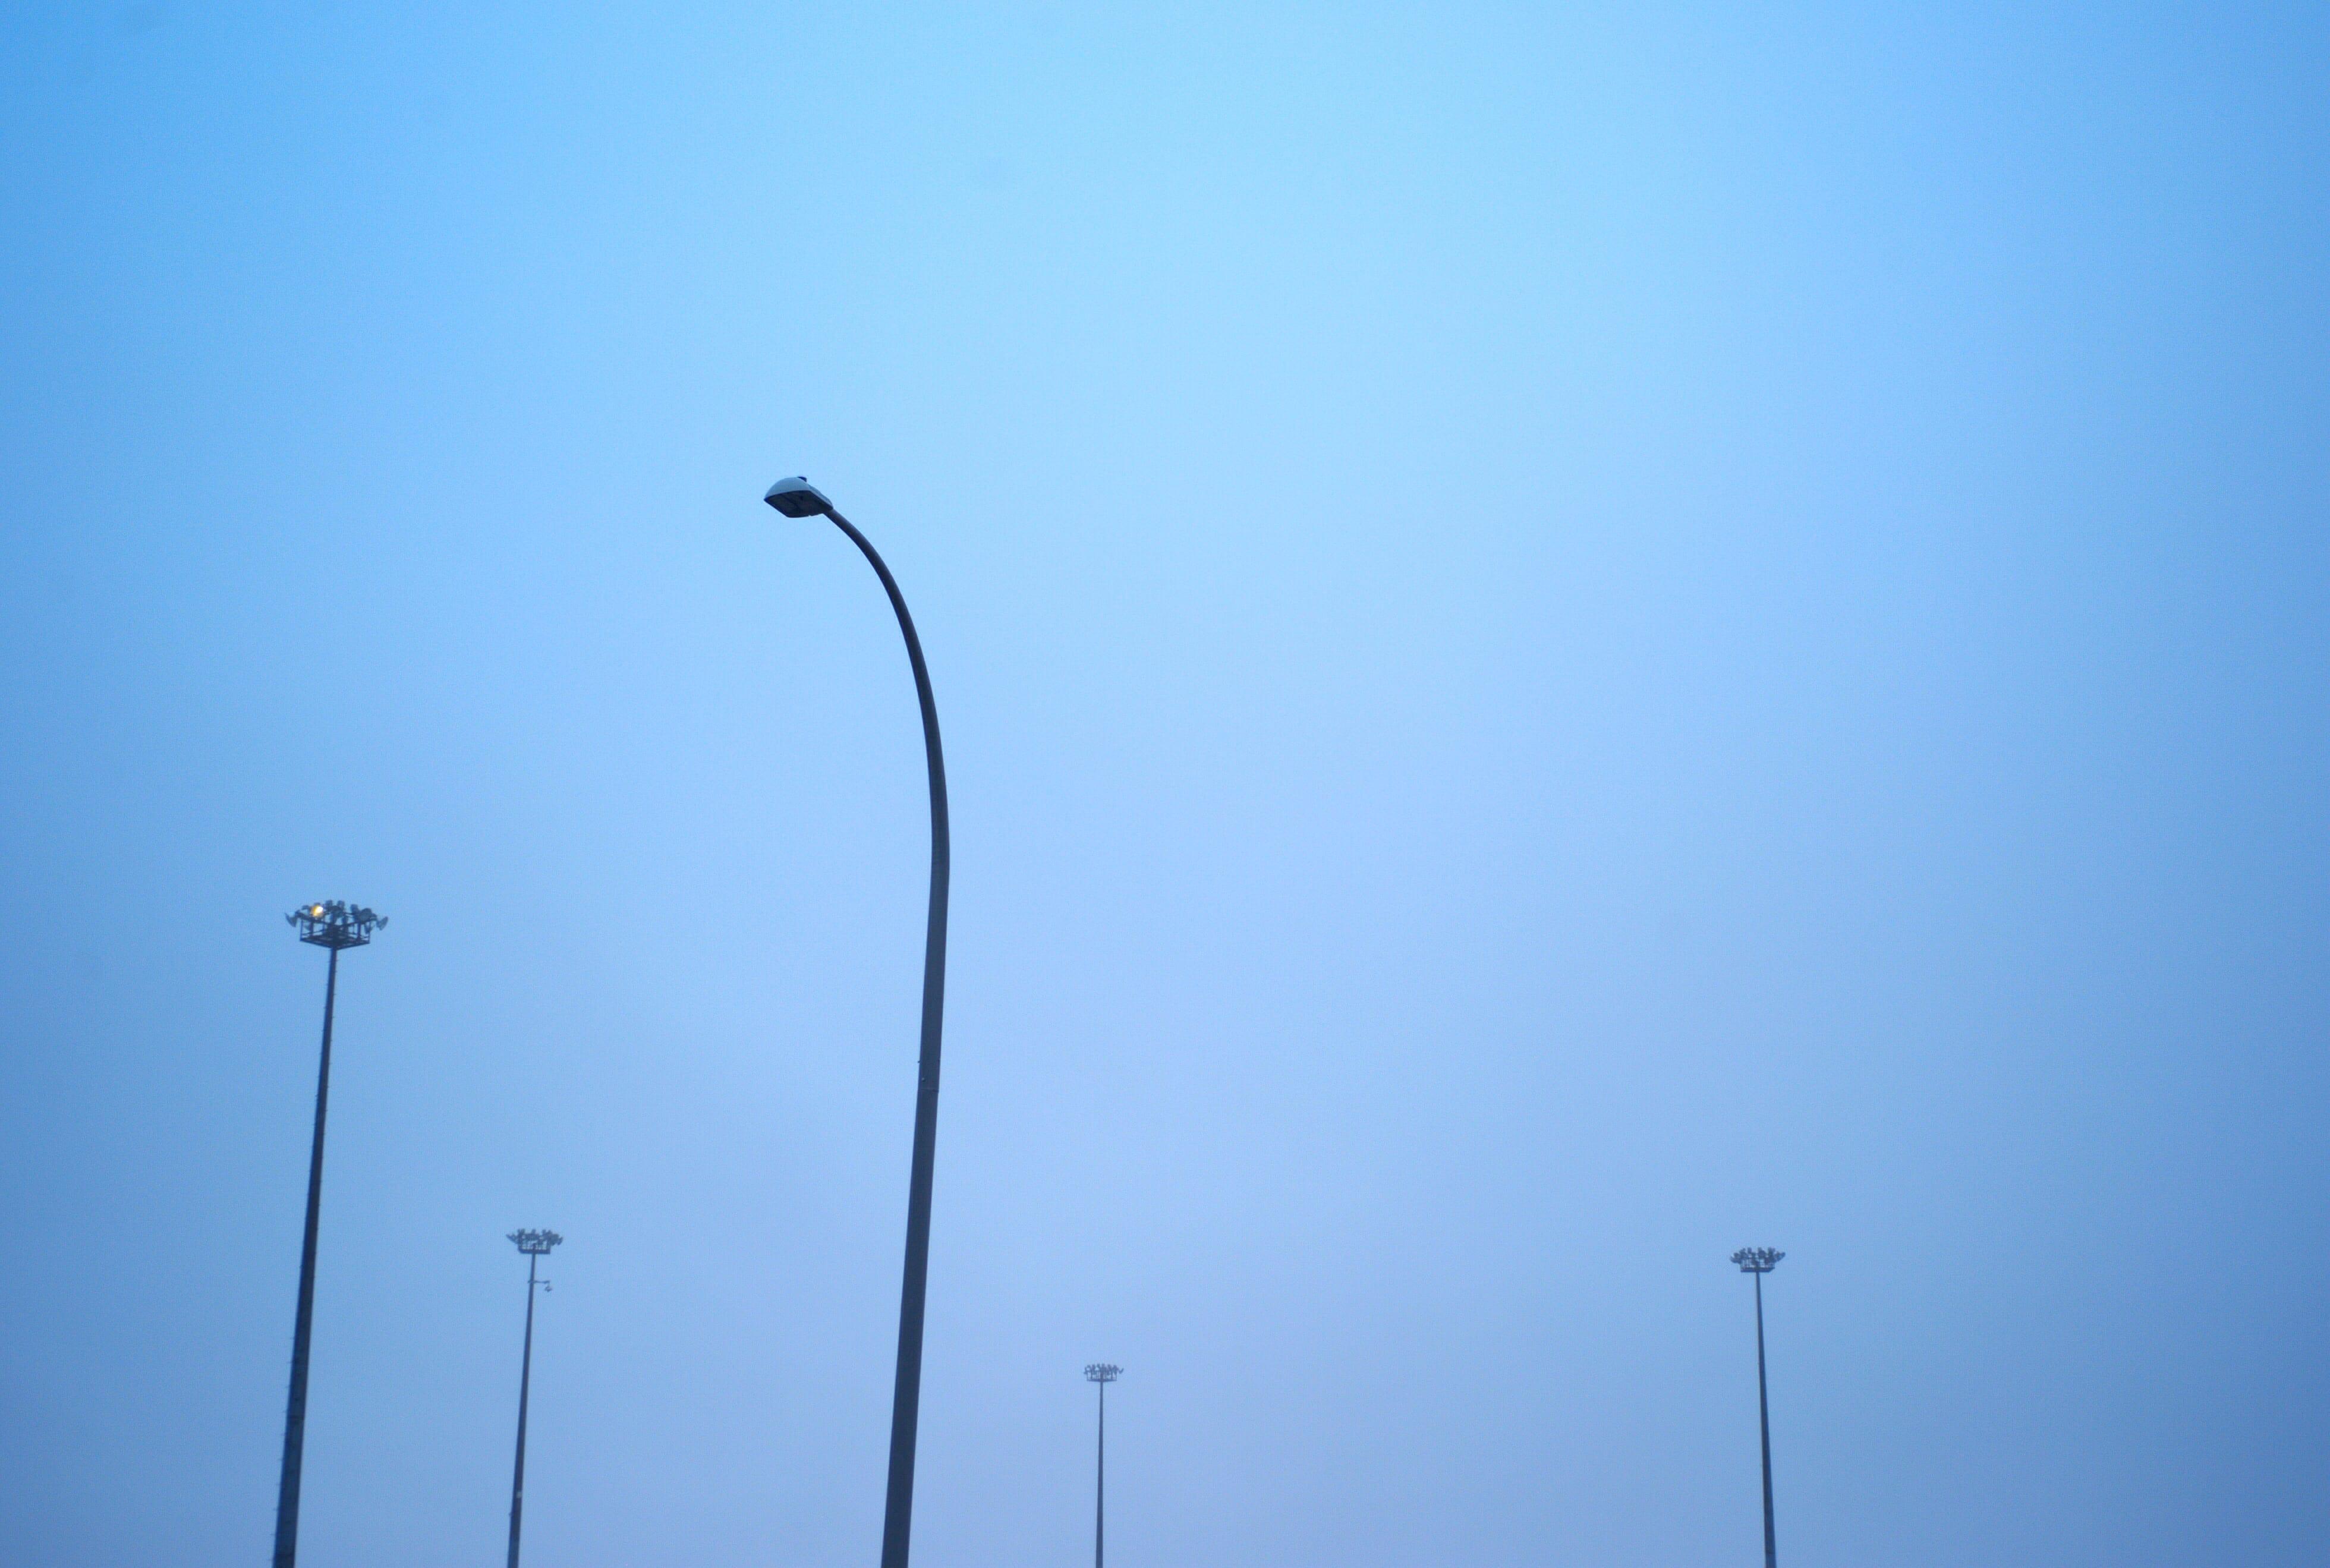 A photograph depicting Port Parking Lot Lights in Saint John